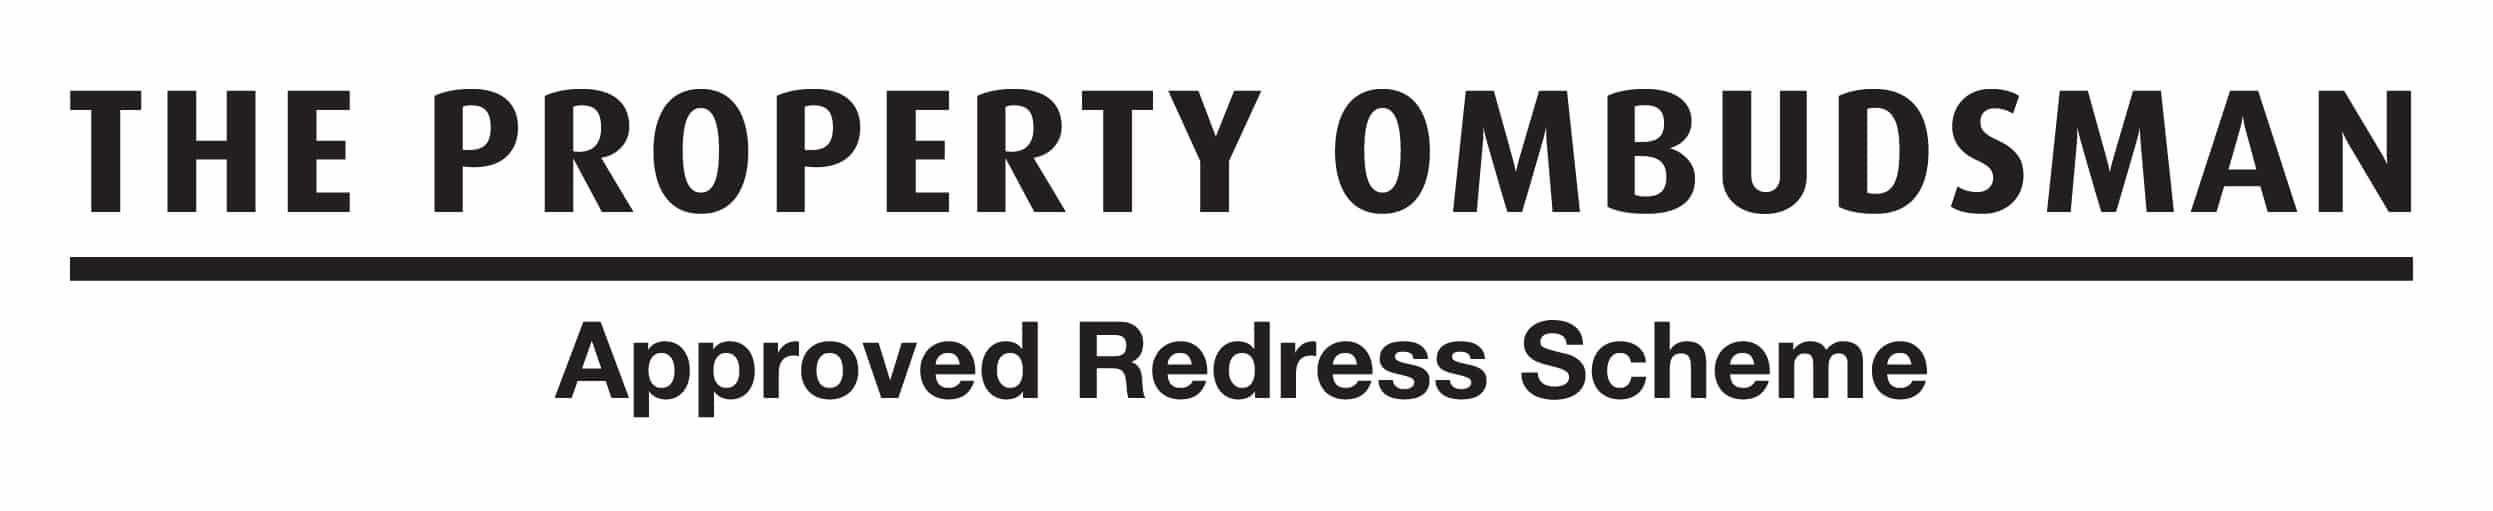 Obbudsman logo